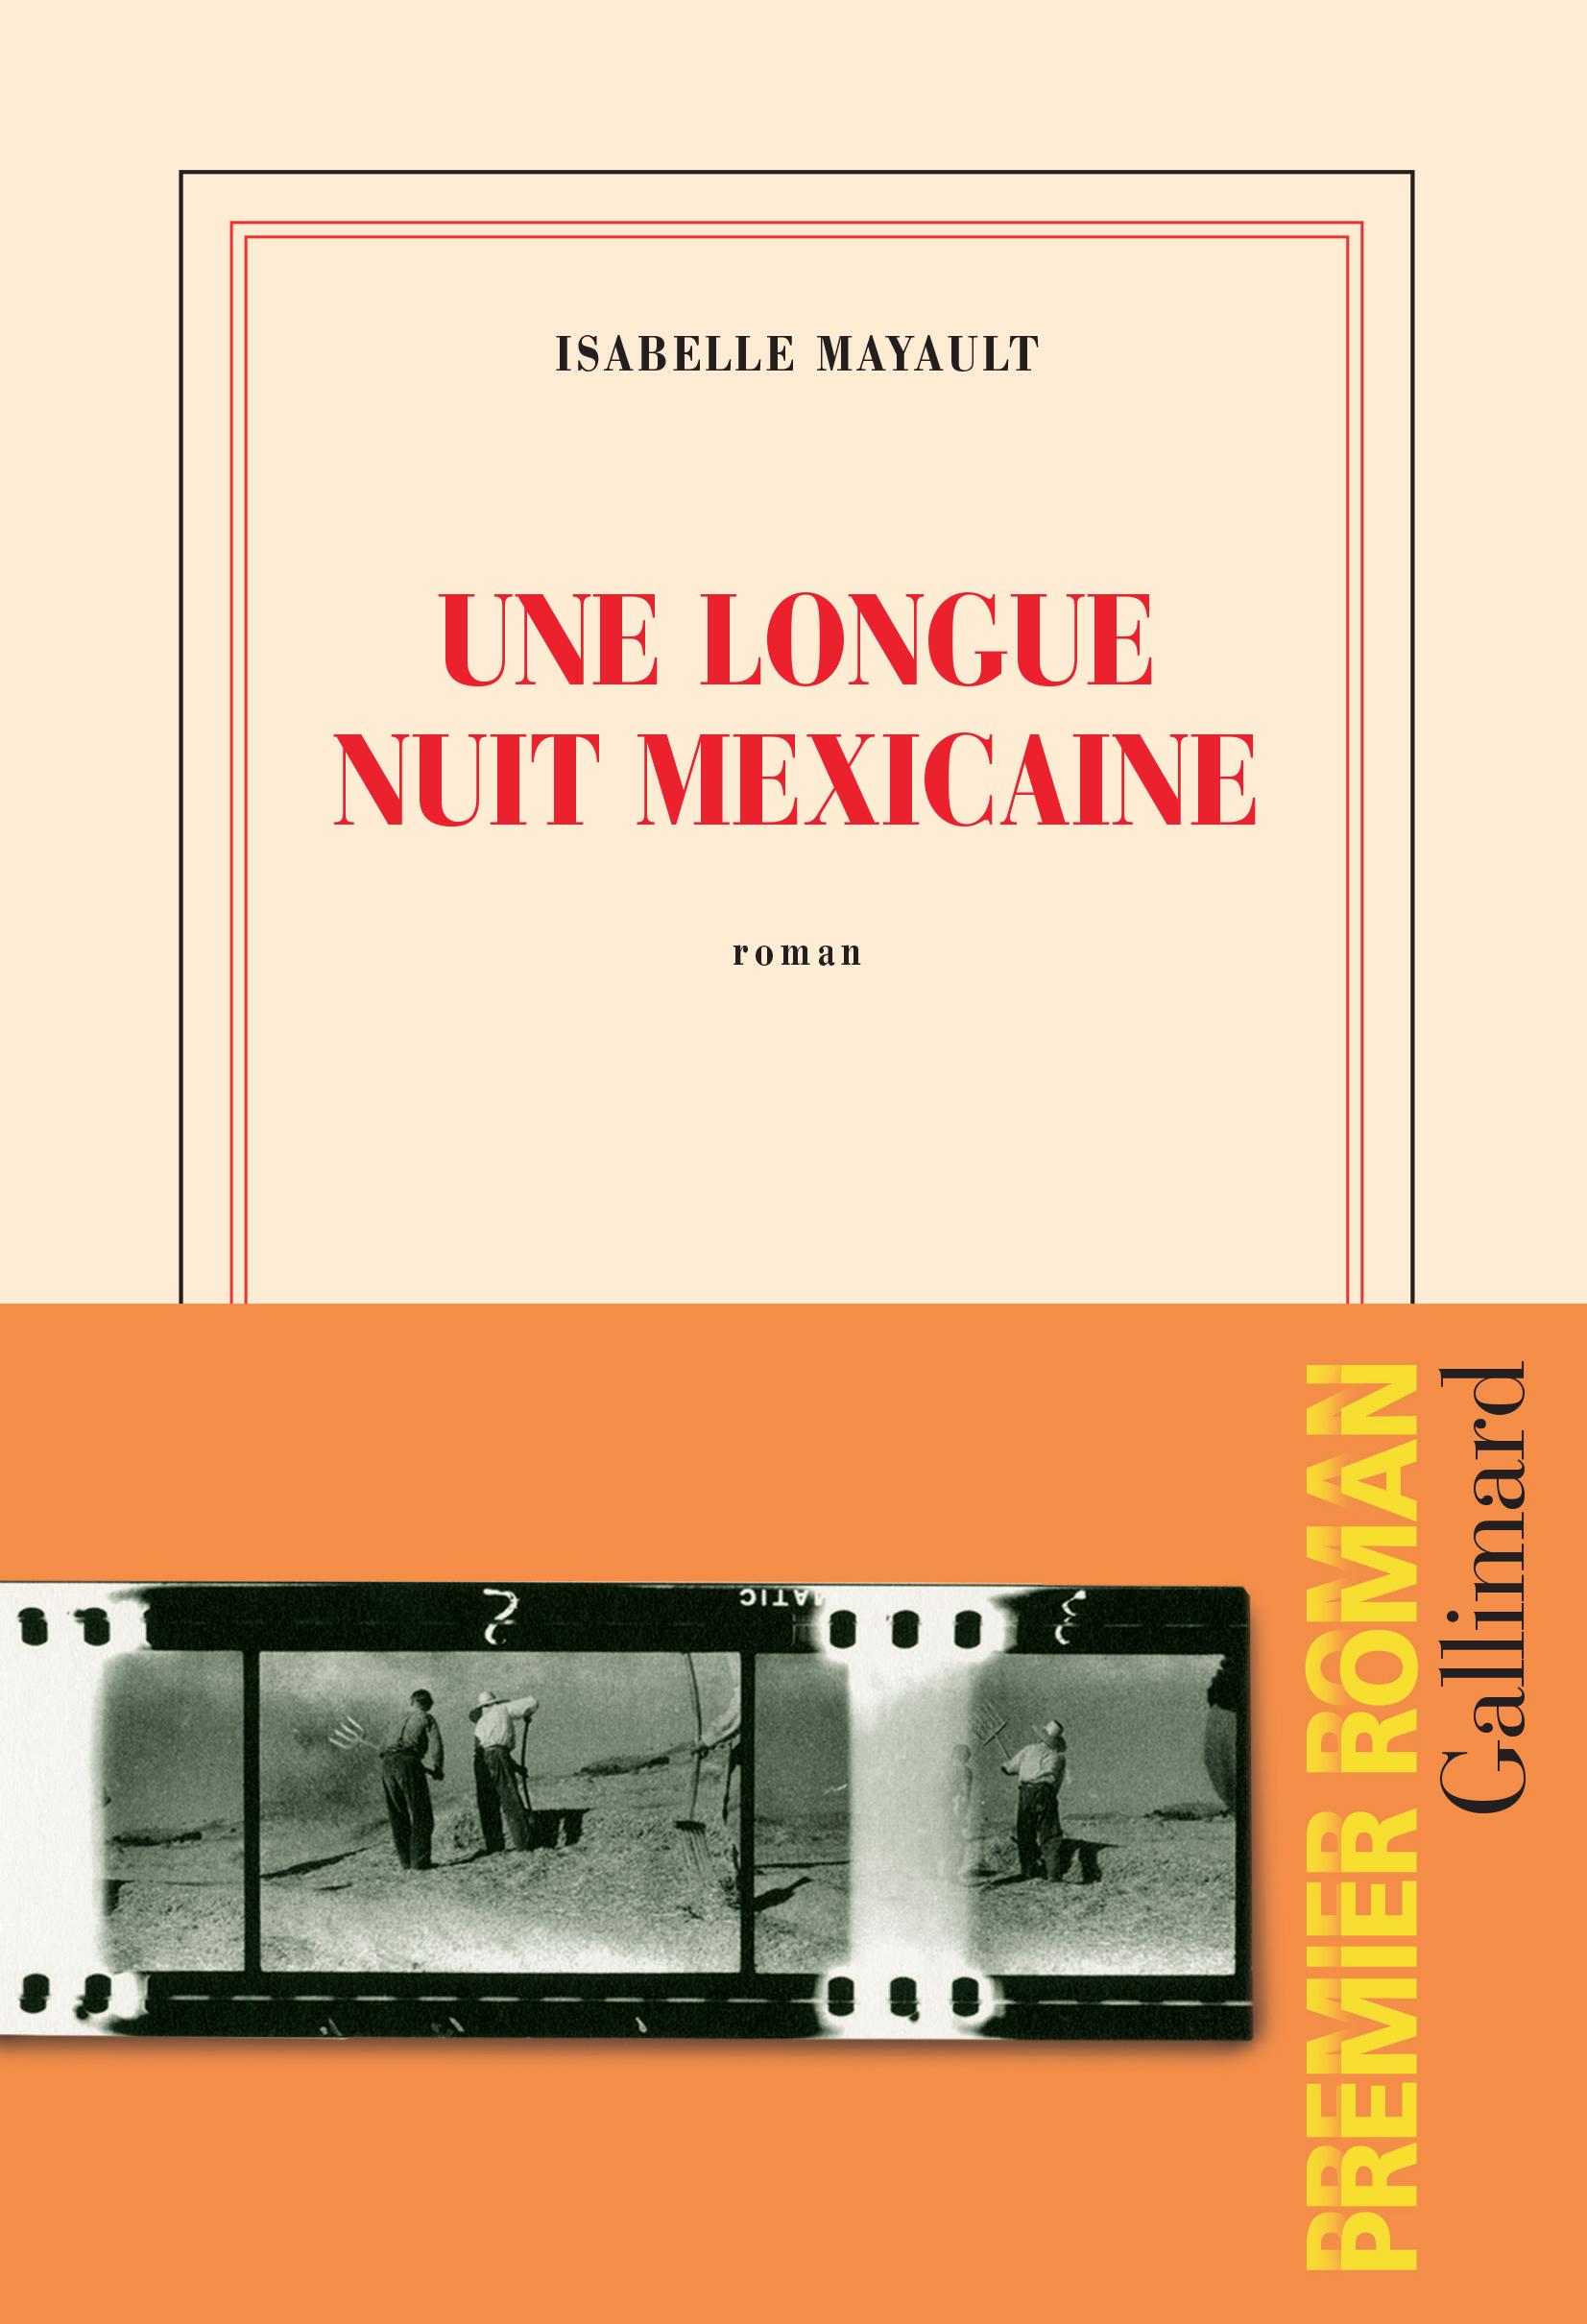 Une longue nuit mexicaine | Mayault, Isabelle